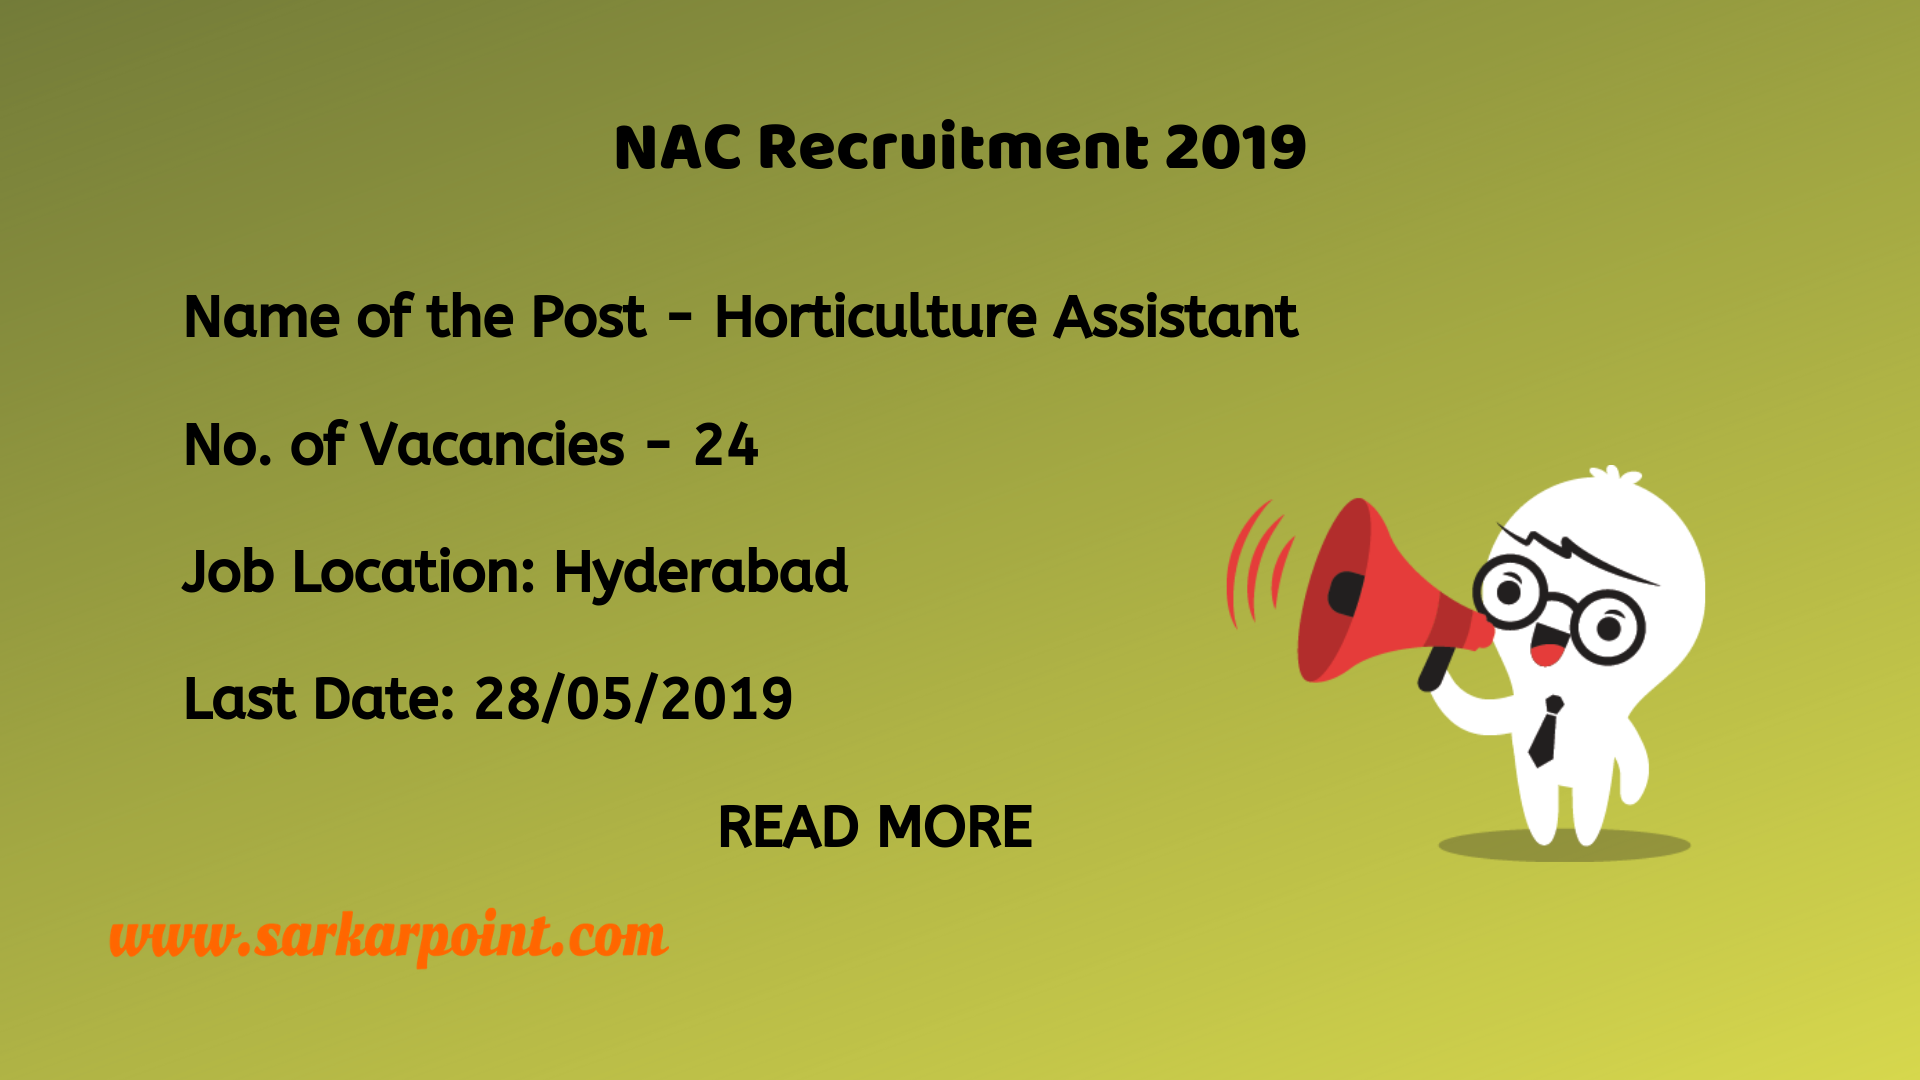 NAC Recruitment 2019.